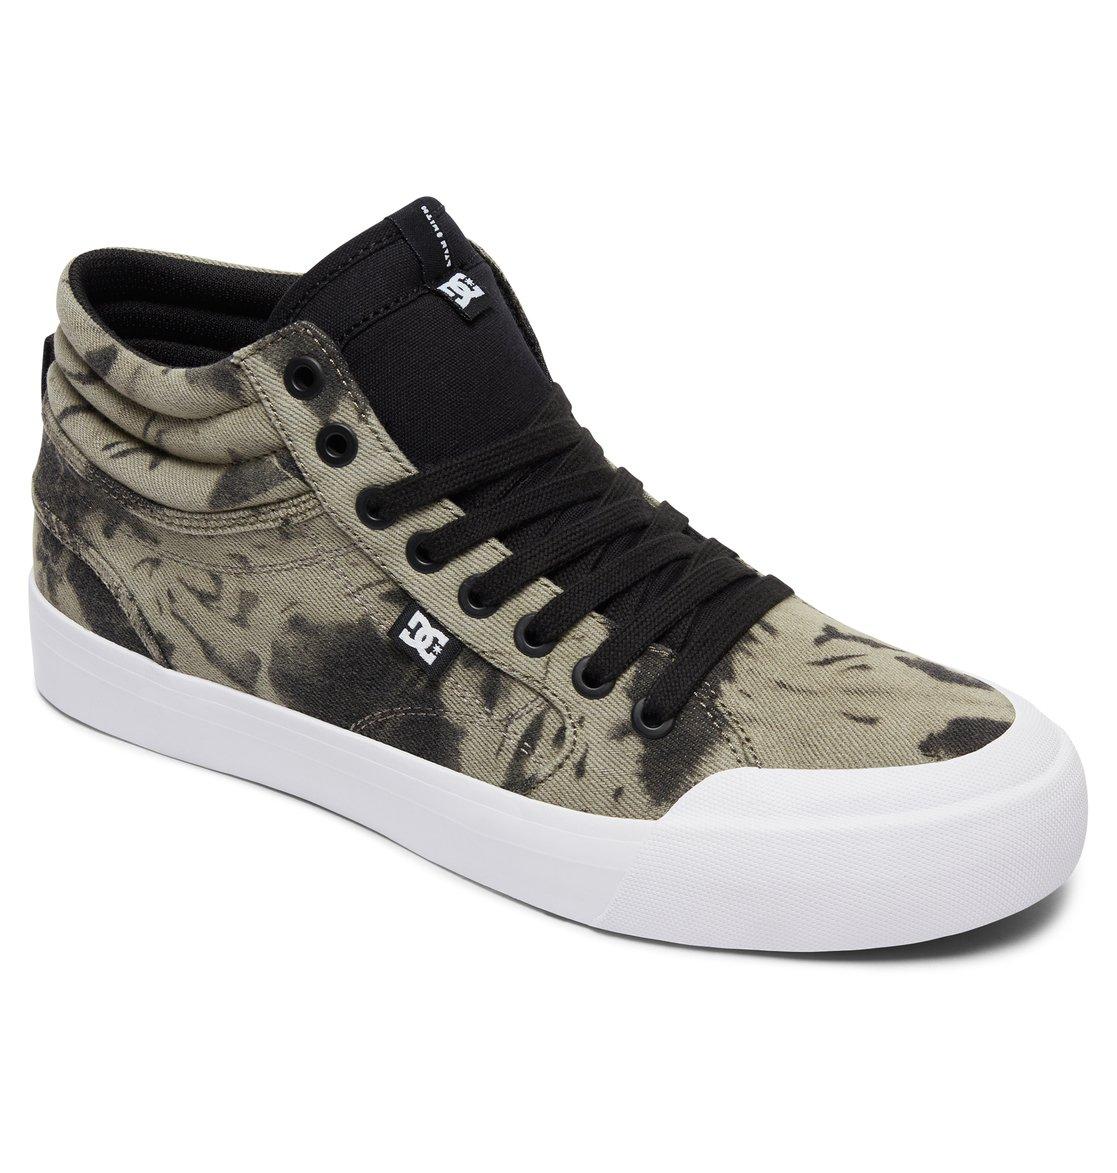 Footwear DC Mens Evan Smith Hi Tx Skate